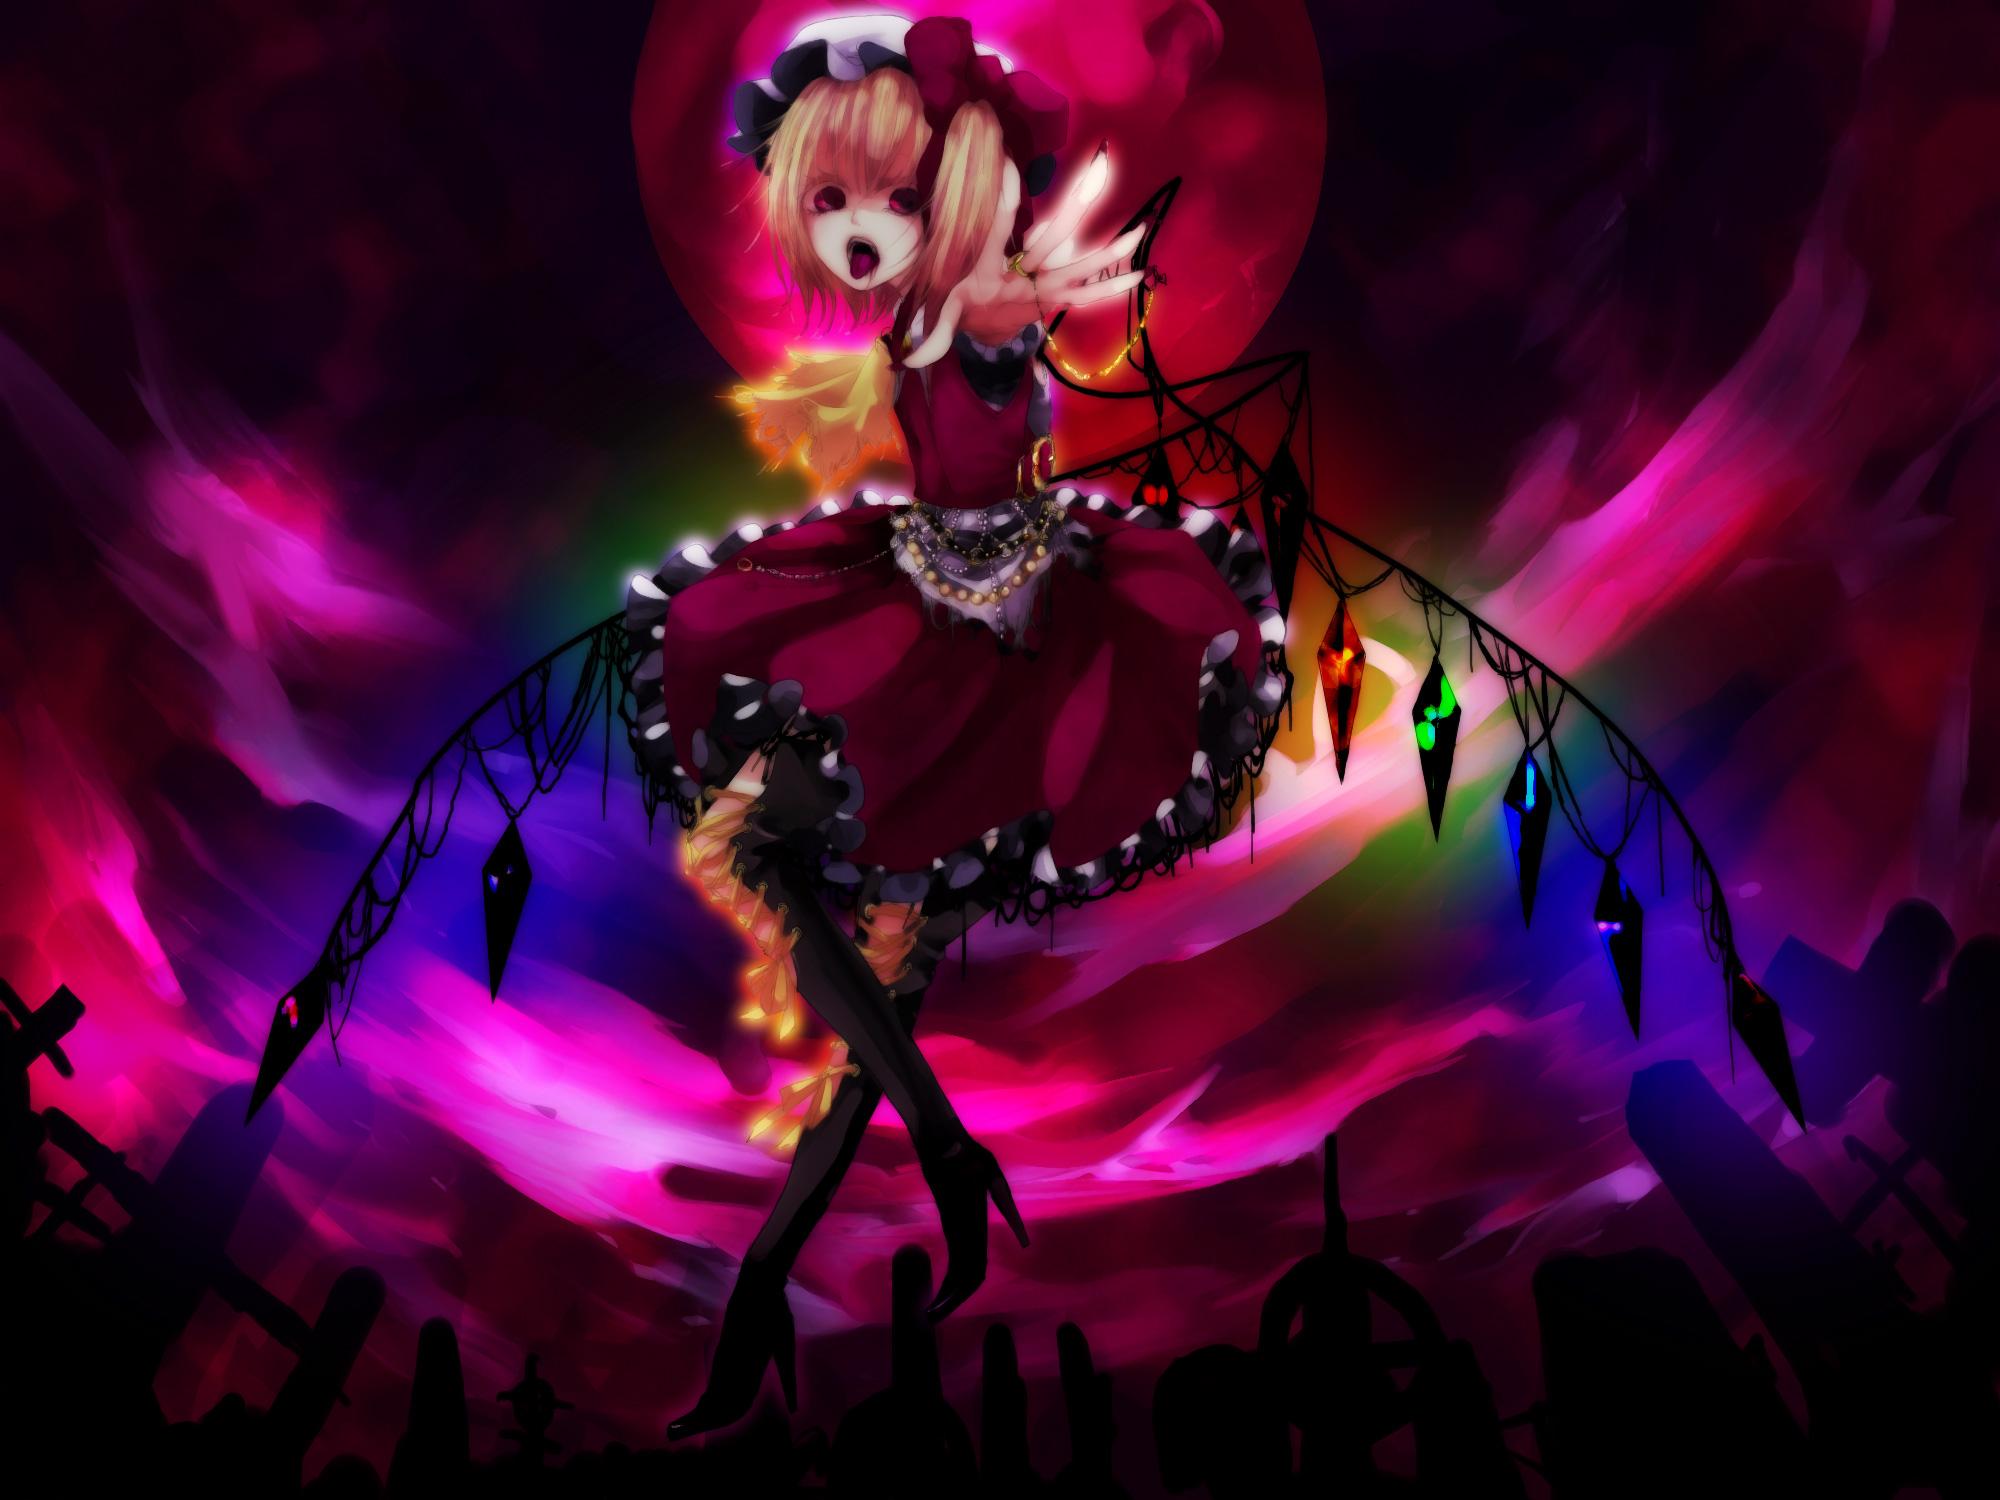 Anime - Touhou  Flandre Scarlet Wallpaper